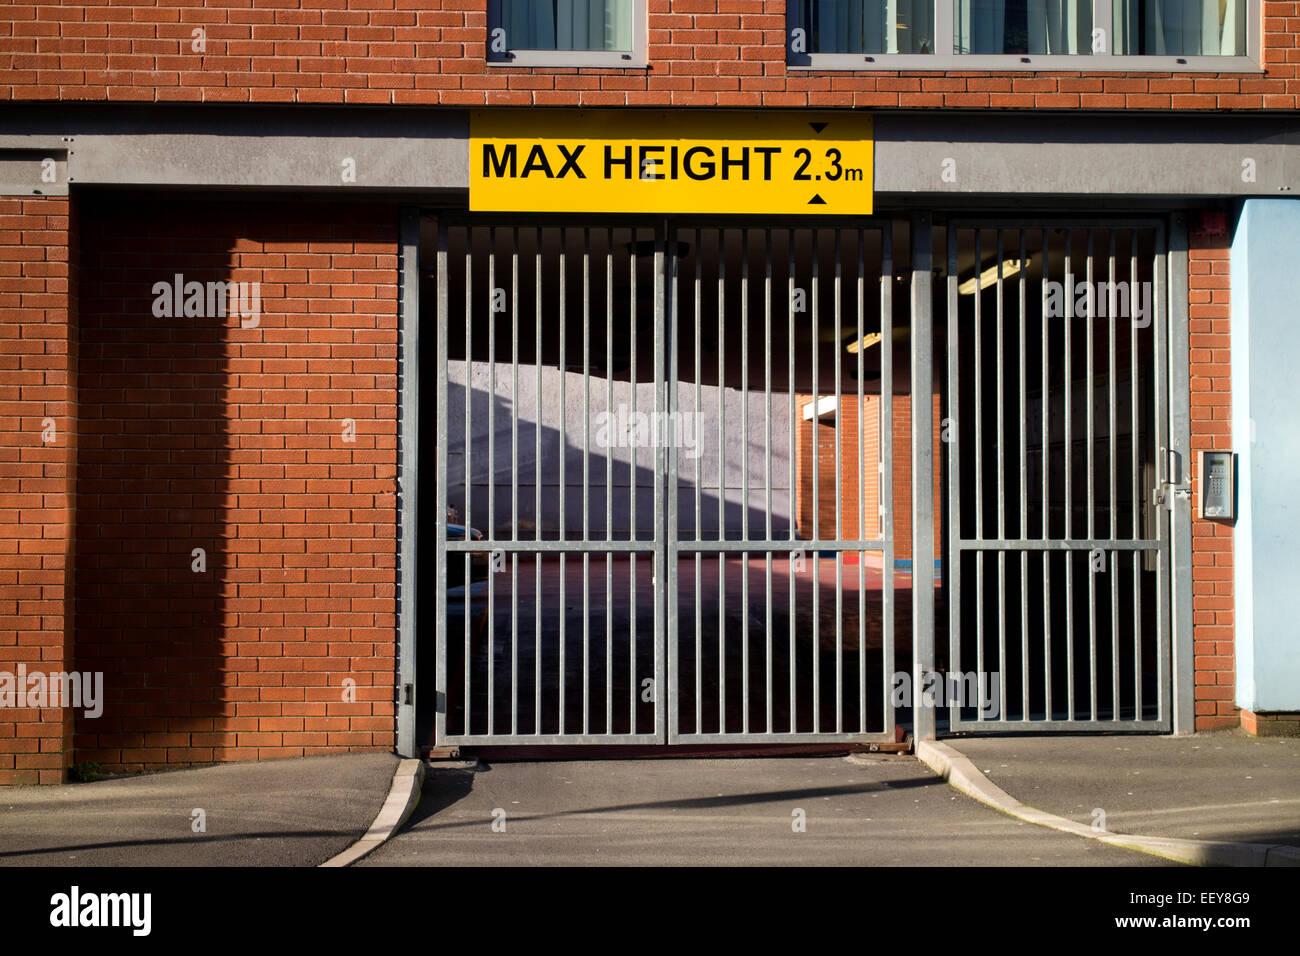 Hauteur Max signe, Birmingham, Royaume-Uni Photo Stock